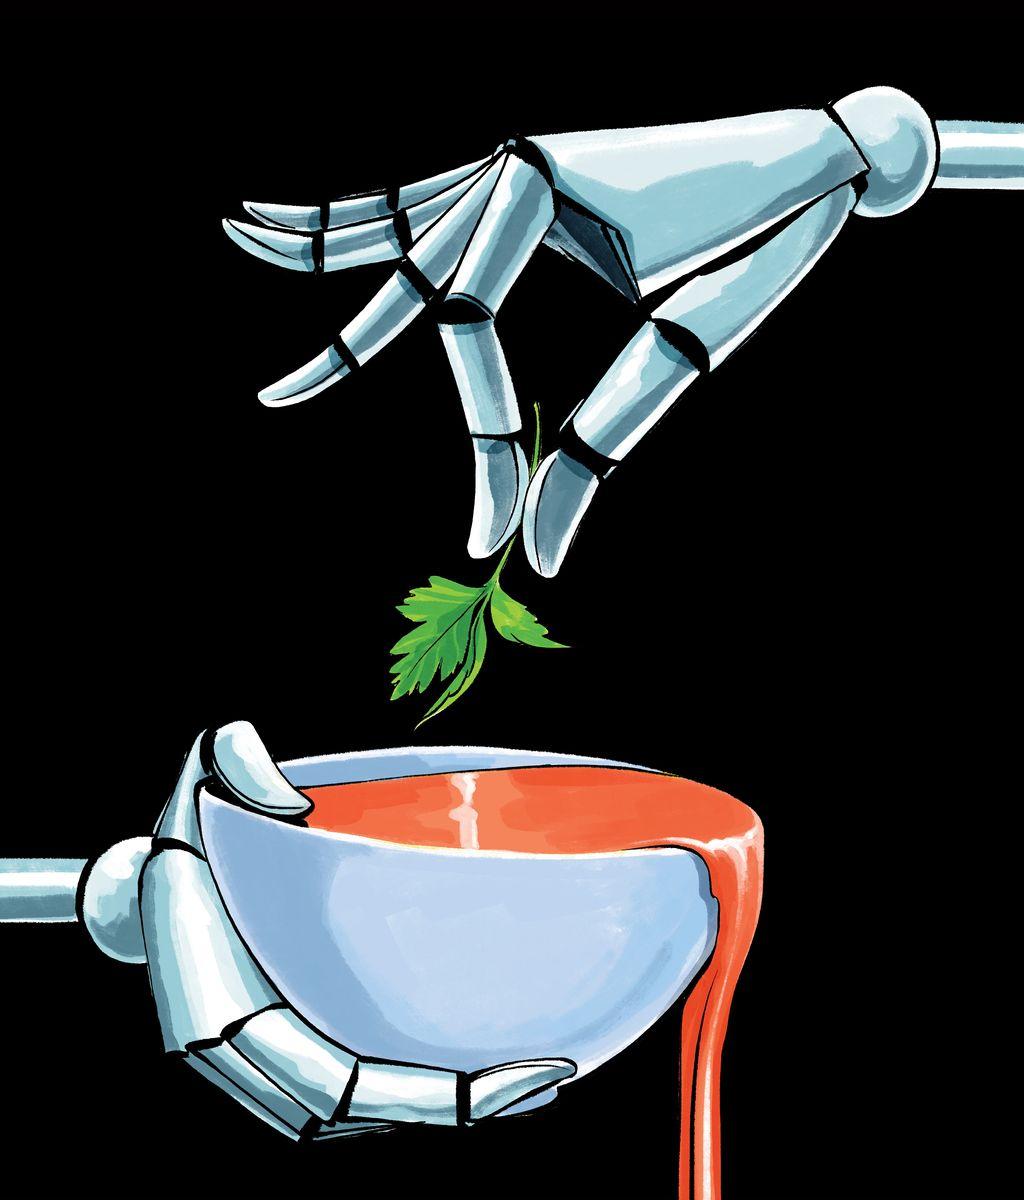 http://pixel.nymag.com/imgs/daily/grub/2017/01/09/robot-chef/09-robot-chef-lede.w512.h600.2x.jpg